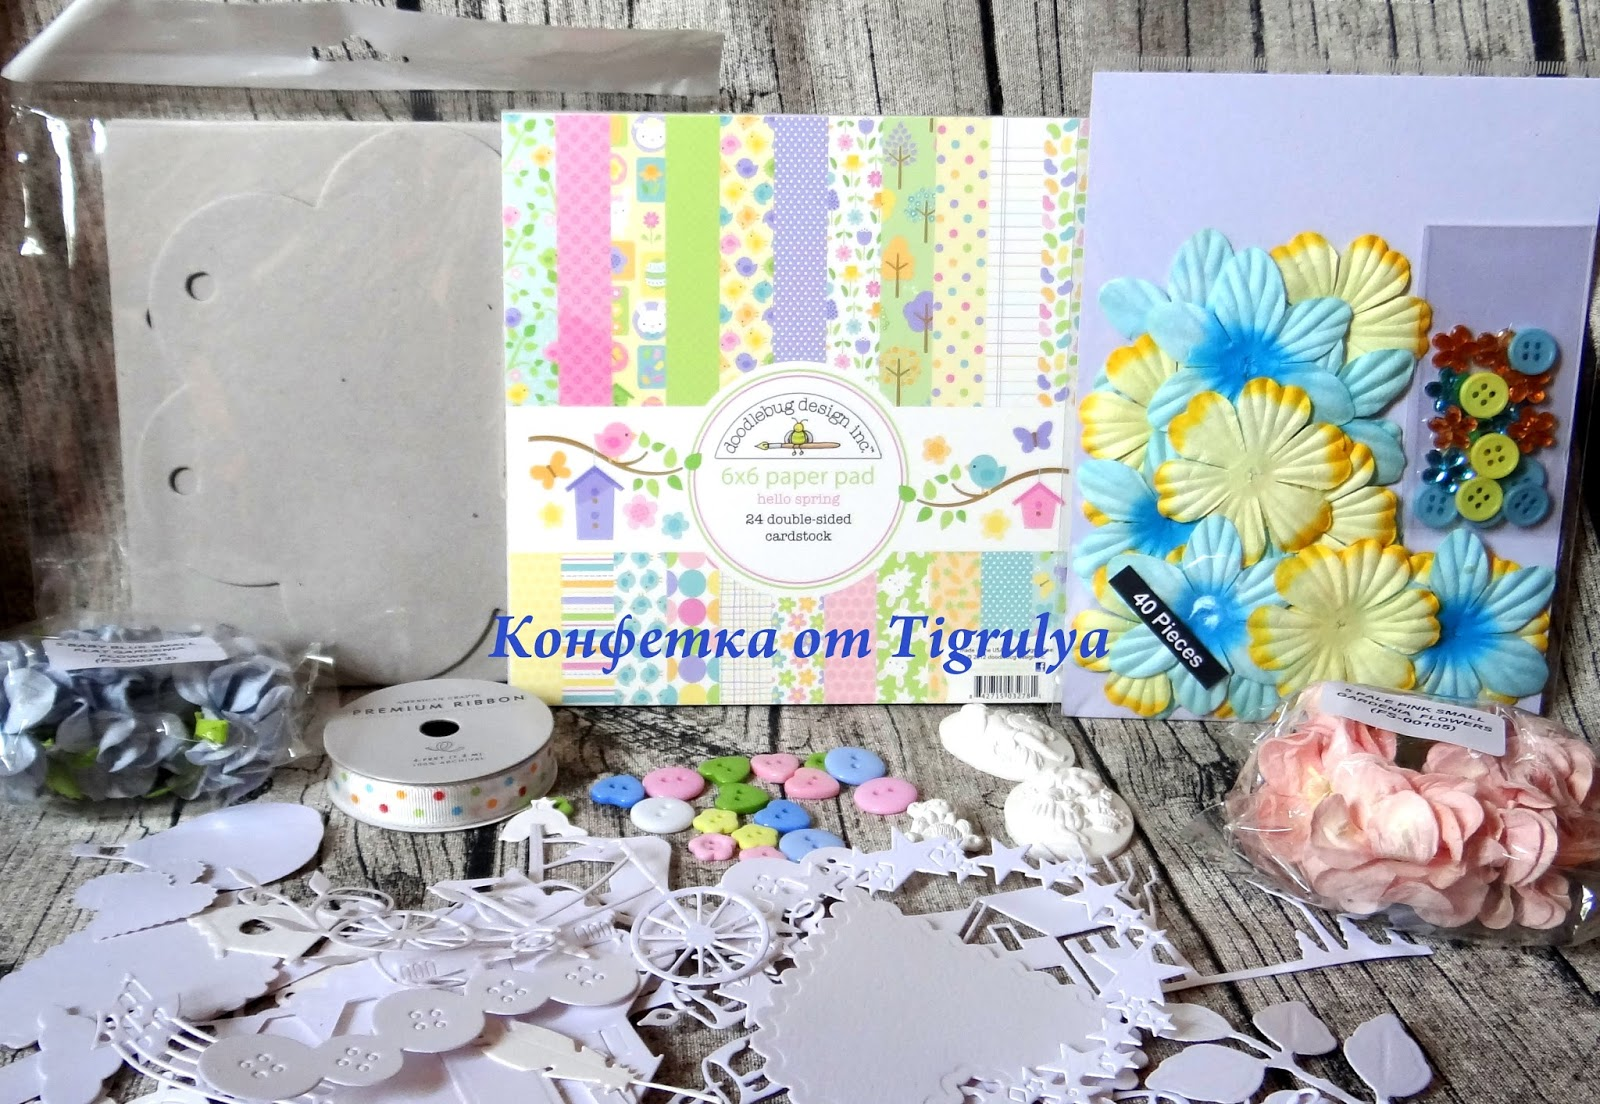 http://lena-papermagic.blogspot.ru/2014/04/blog-post_22.html